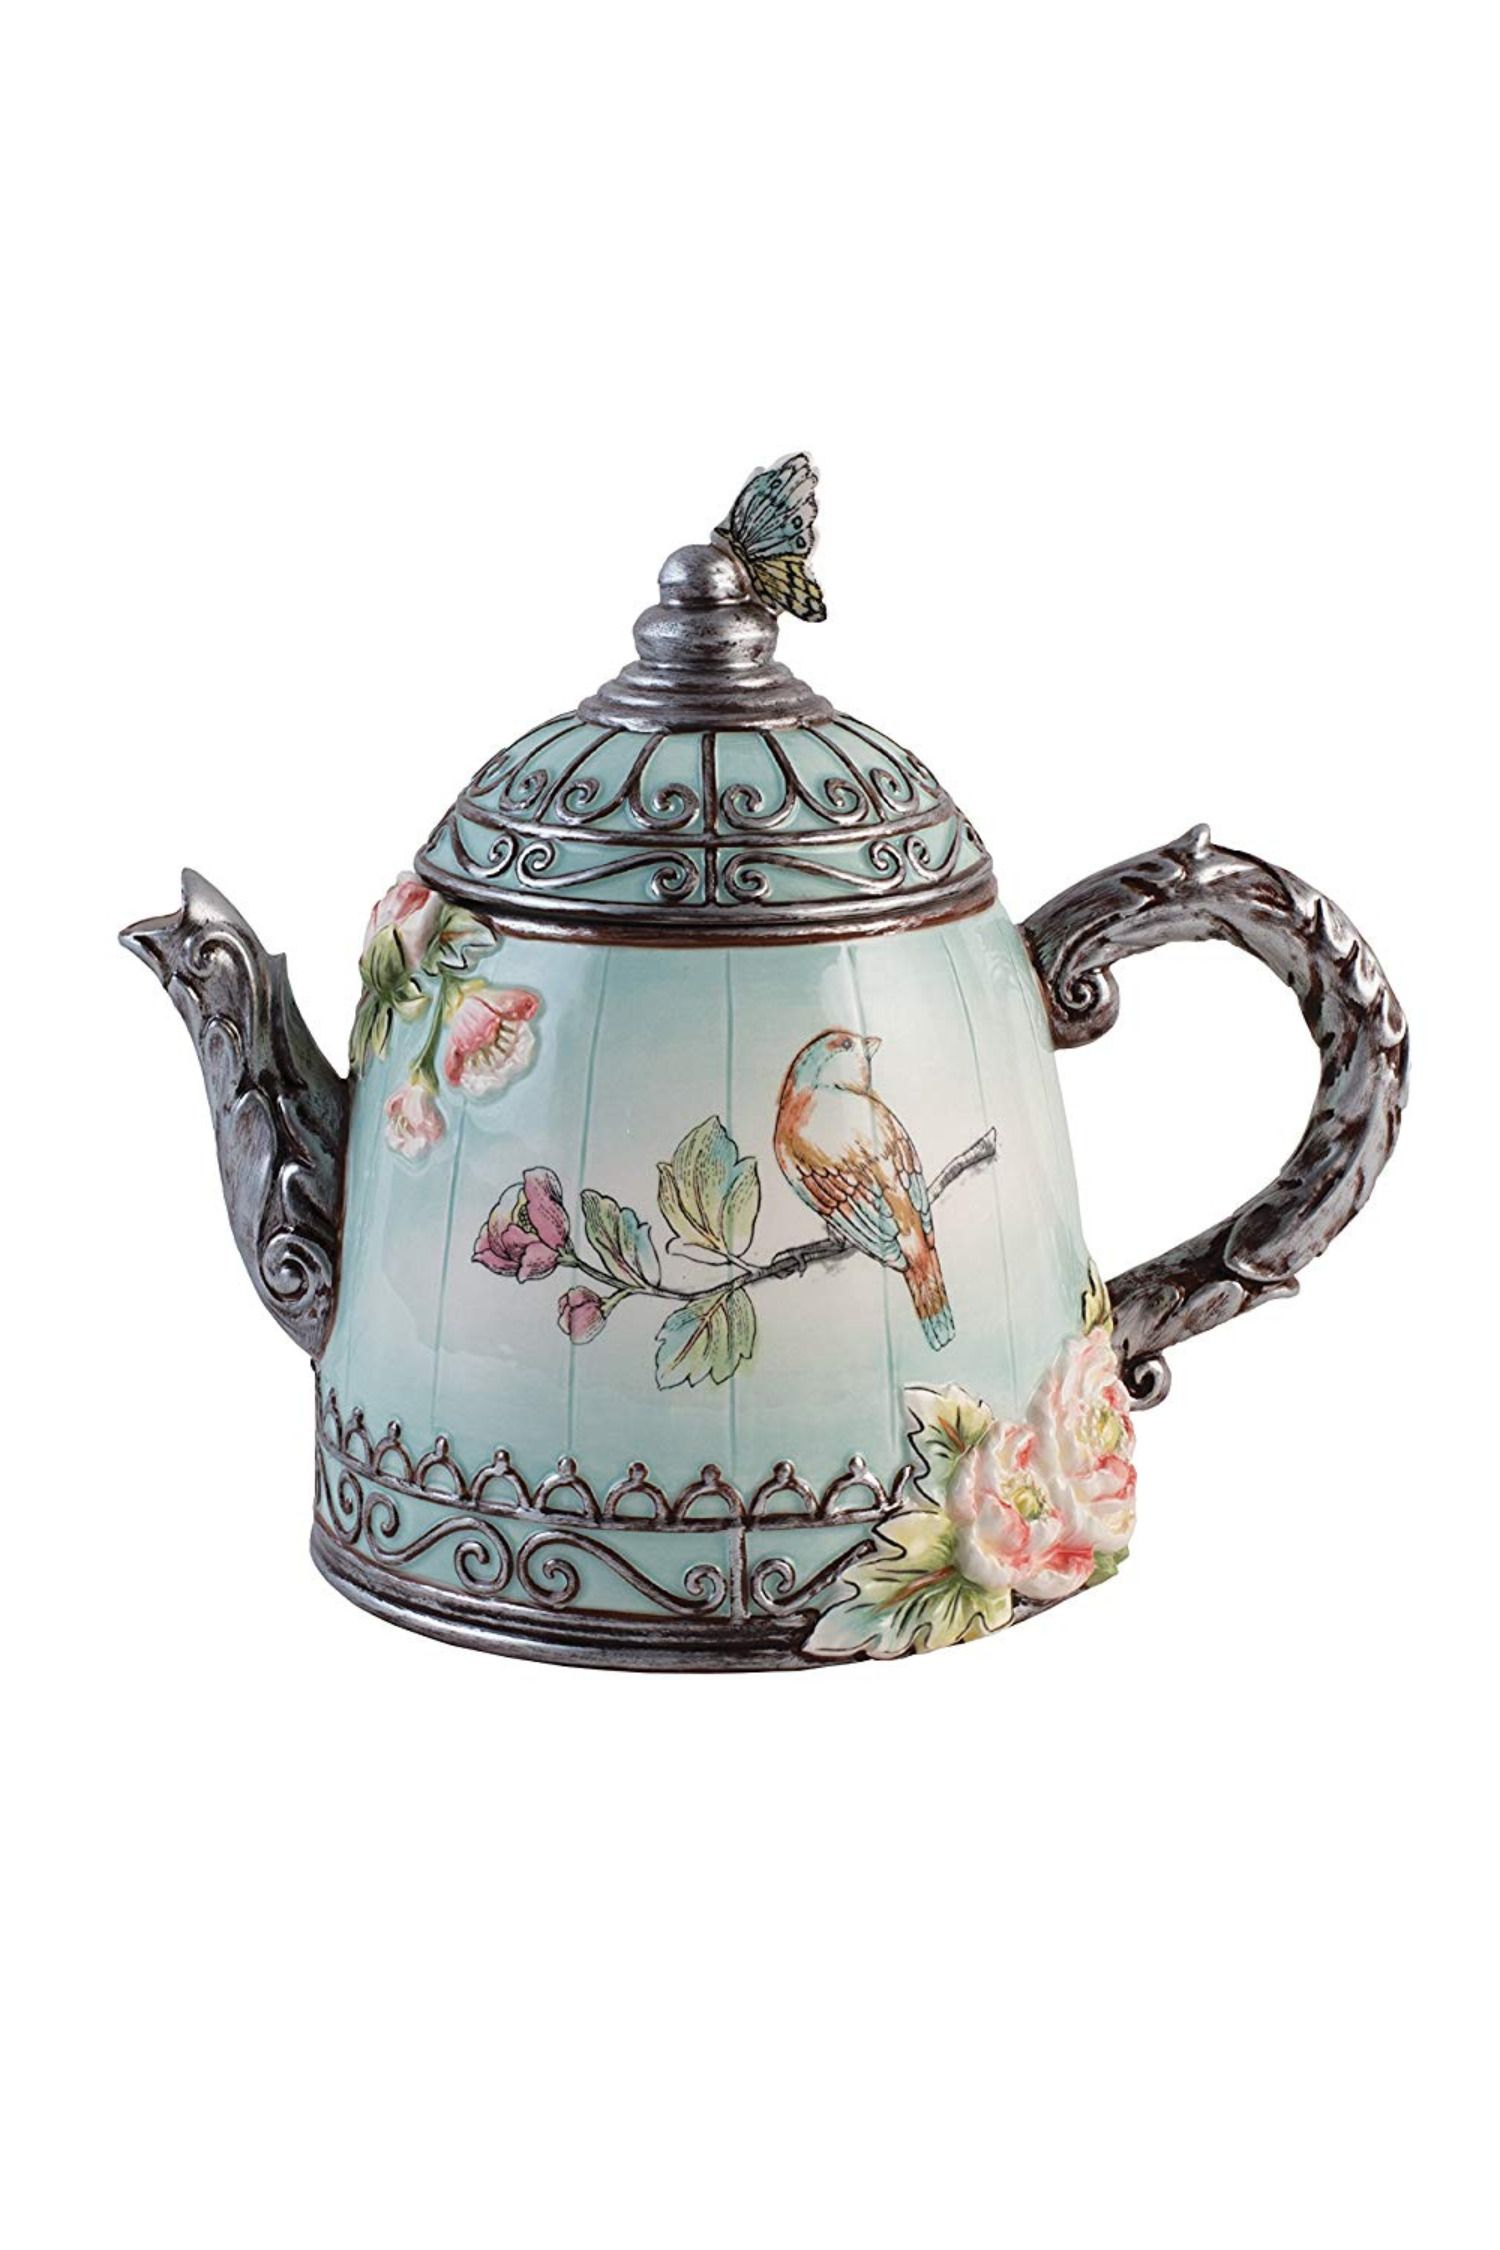 Fitz And Floyd English Garden Teapot Tea Pots Tea Pots Vintage Fitz And Floyd